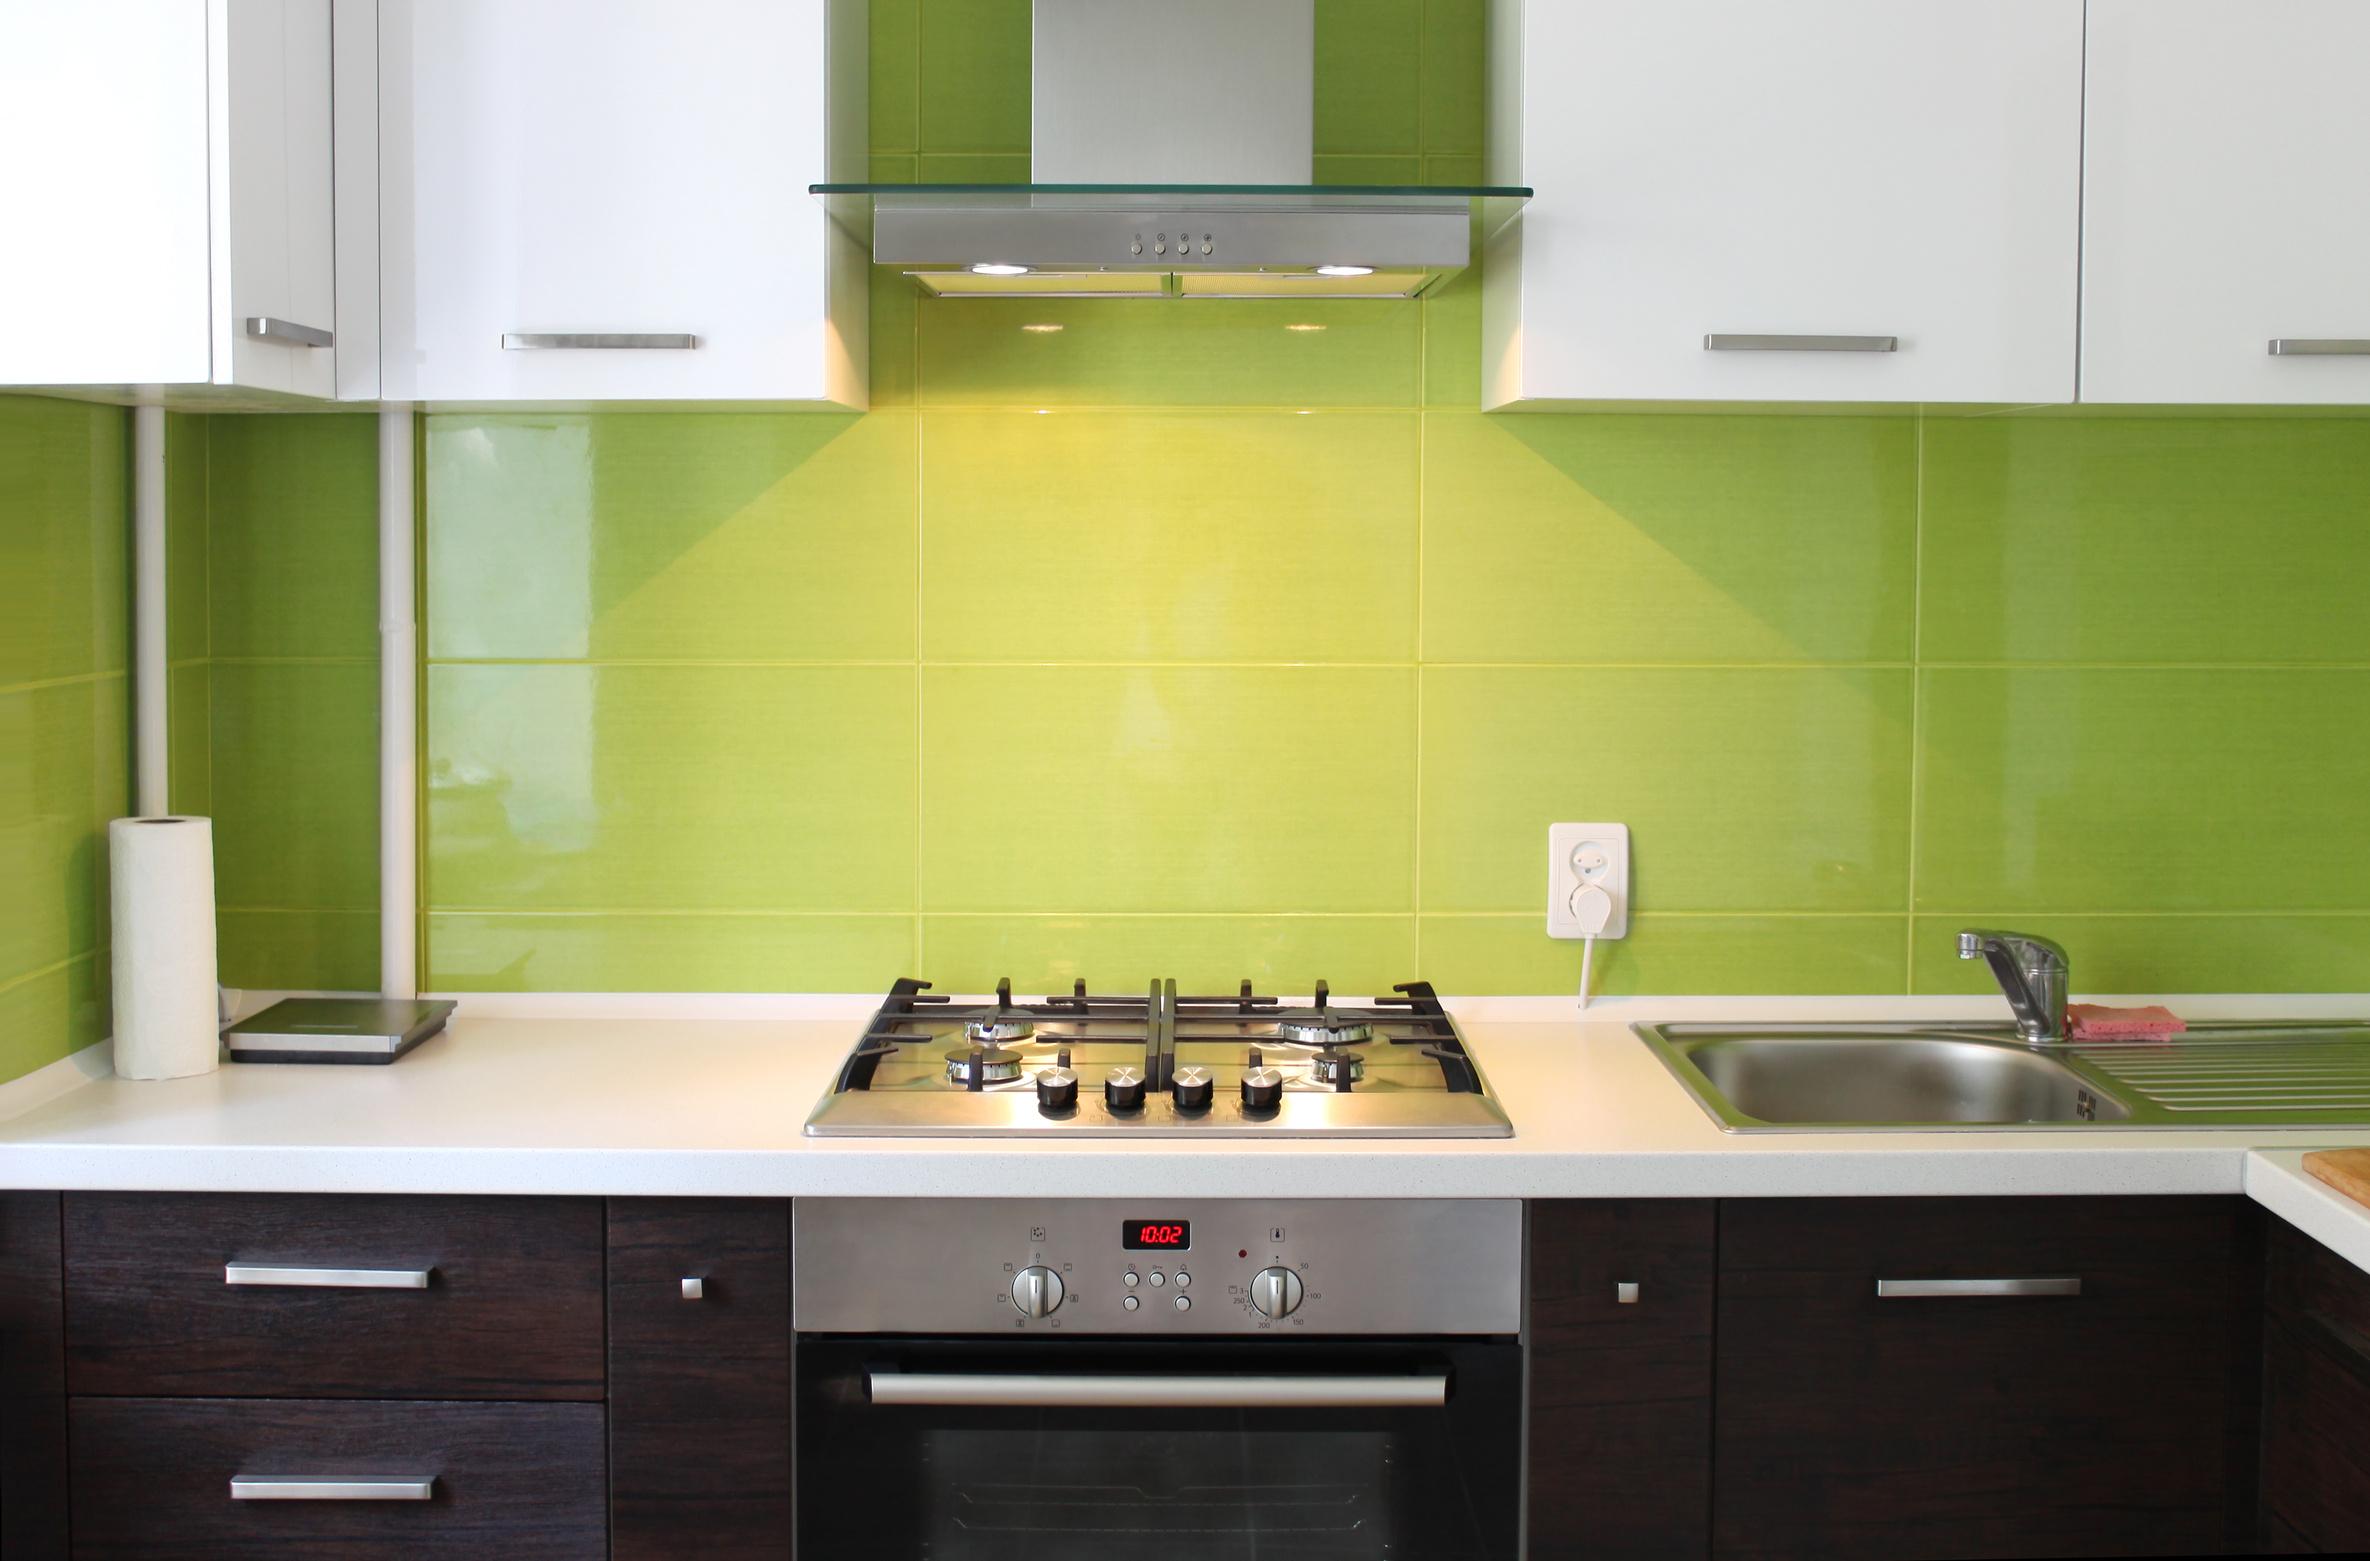 residential glass installation kitchen glass backsplash modern Kitchen backsplash Glass backsplash